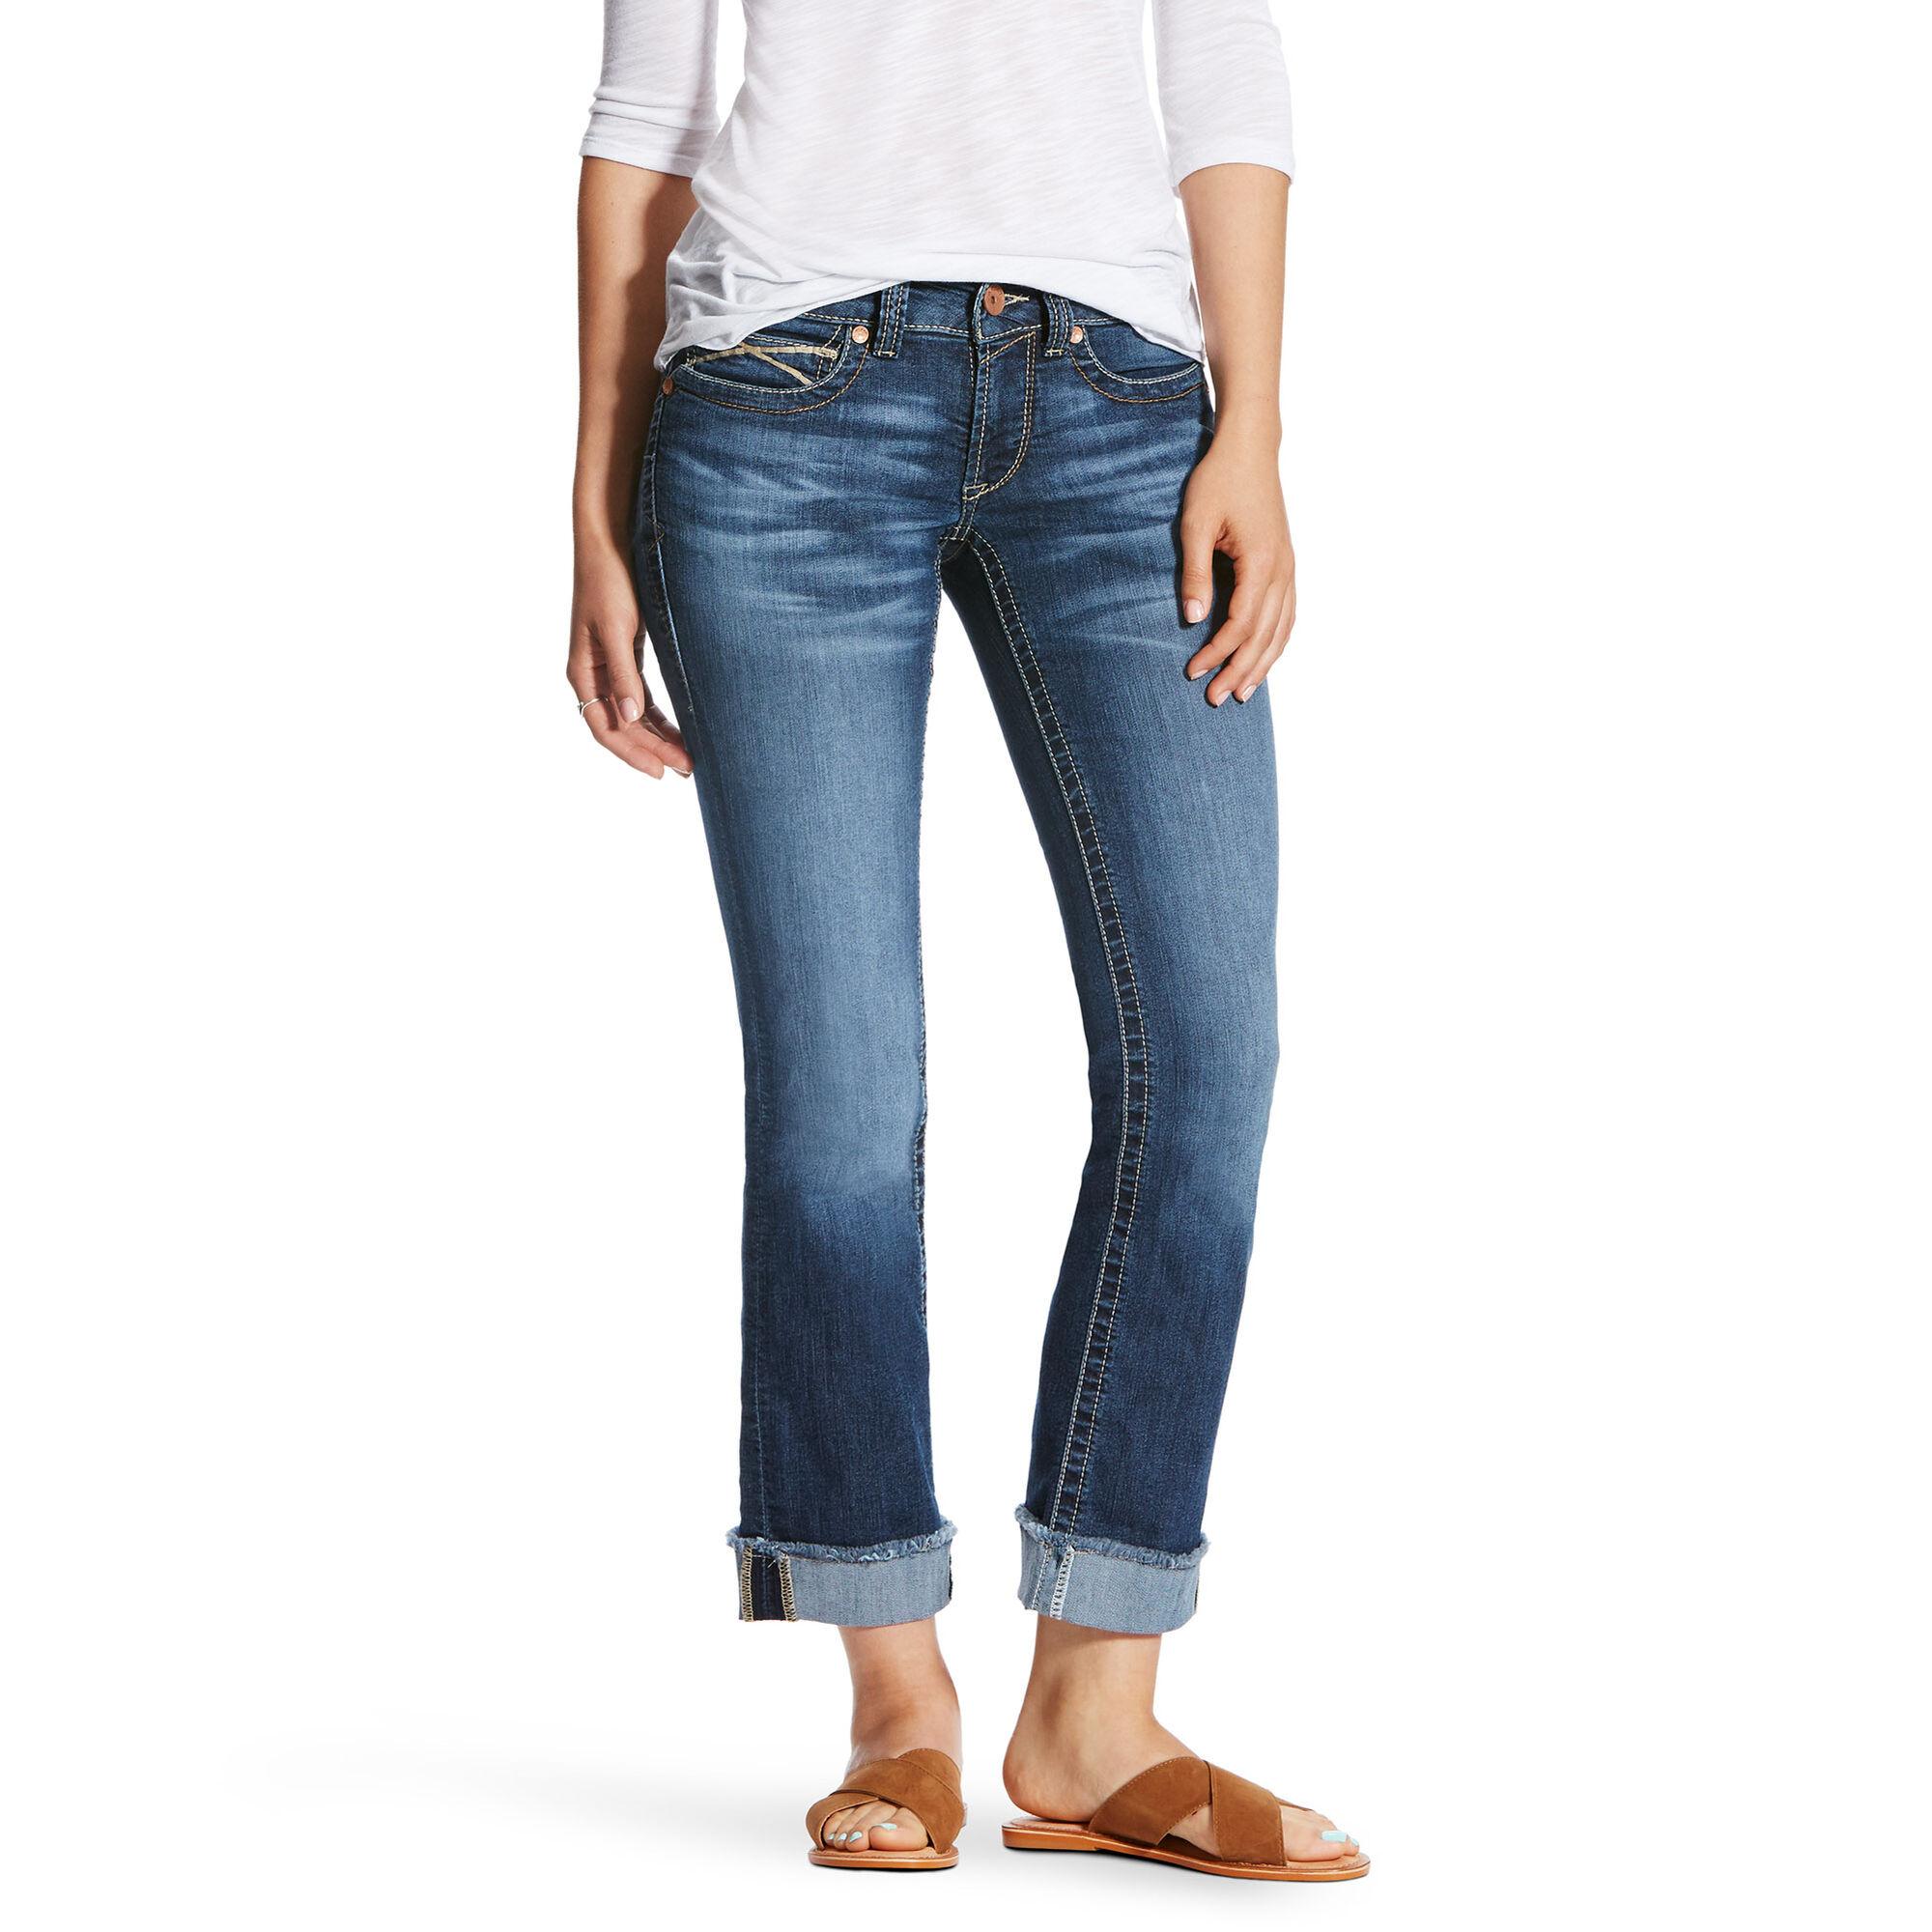 R.E.A.L Mid Rise Baseball Stitch Stackable Straight Leg Jean